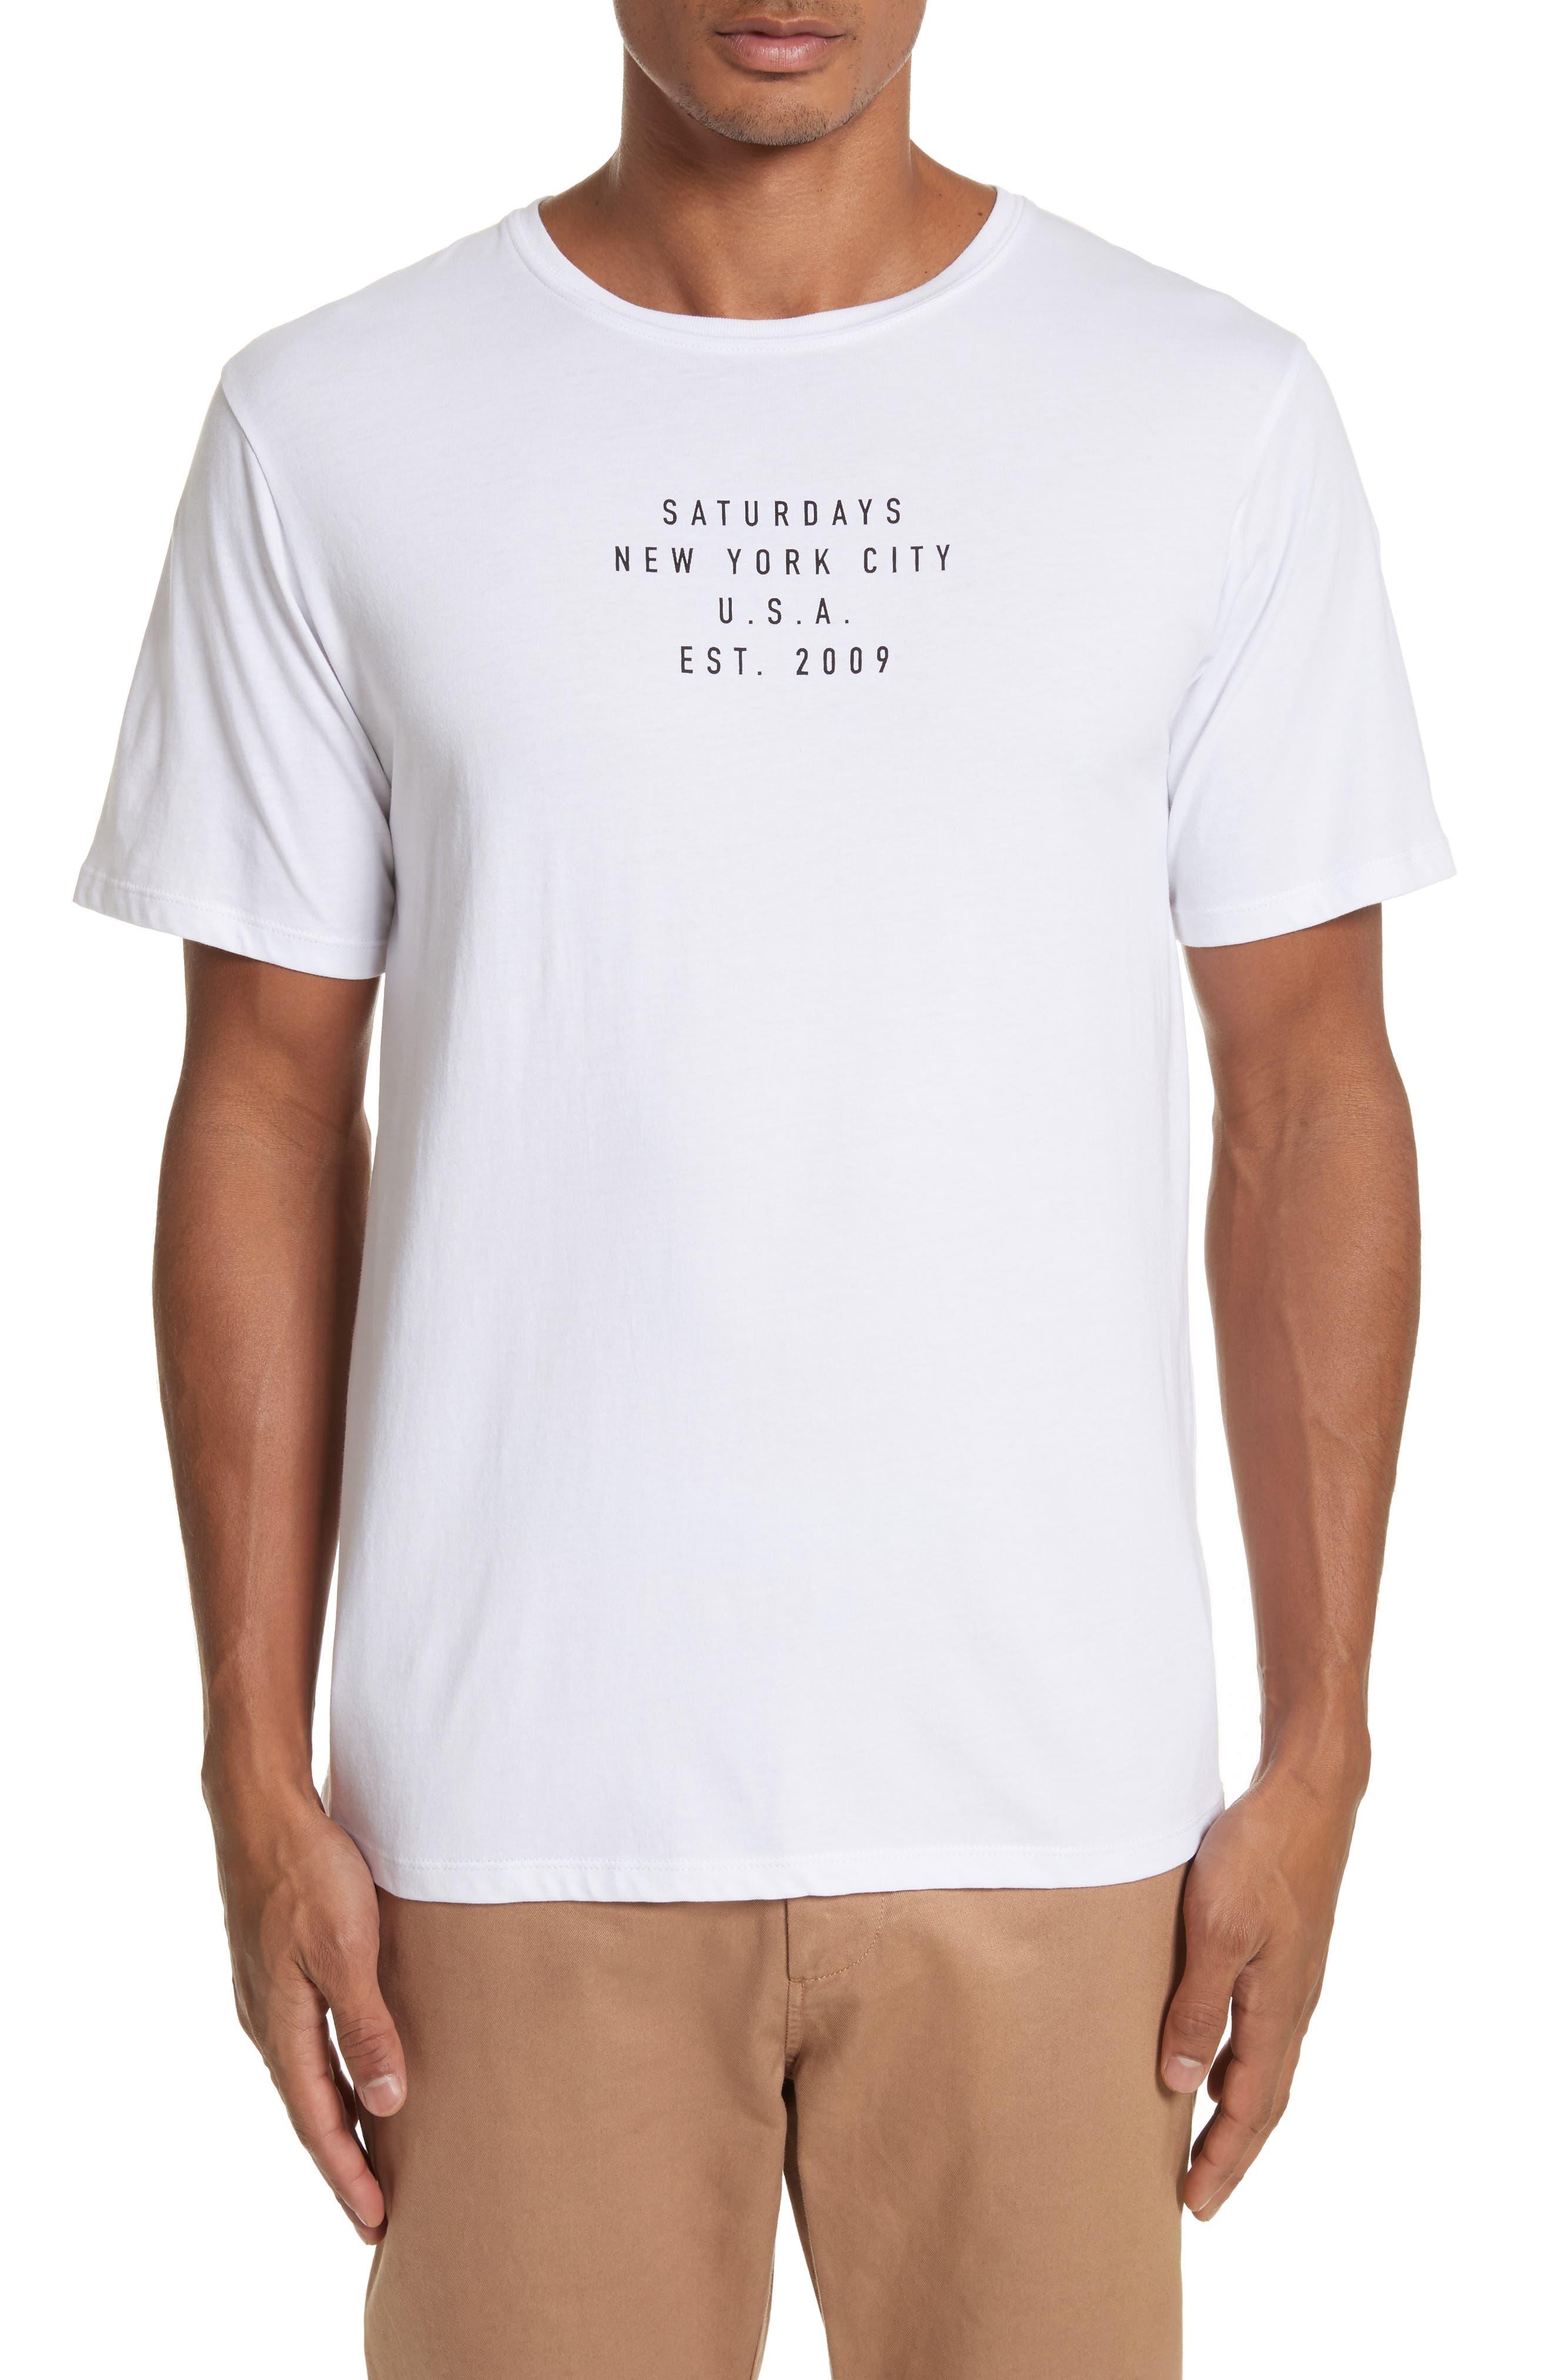 Main Image - Saturdays USA Established Graphic T-Shirt